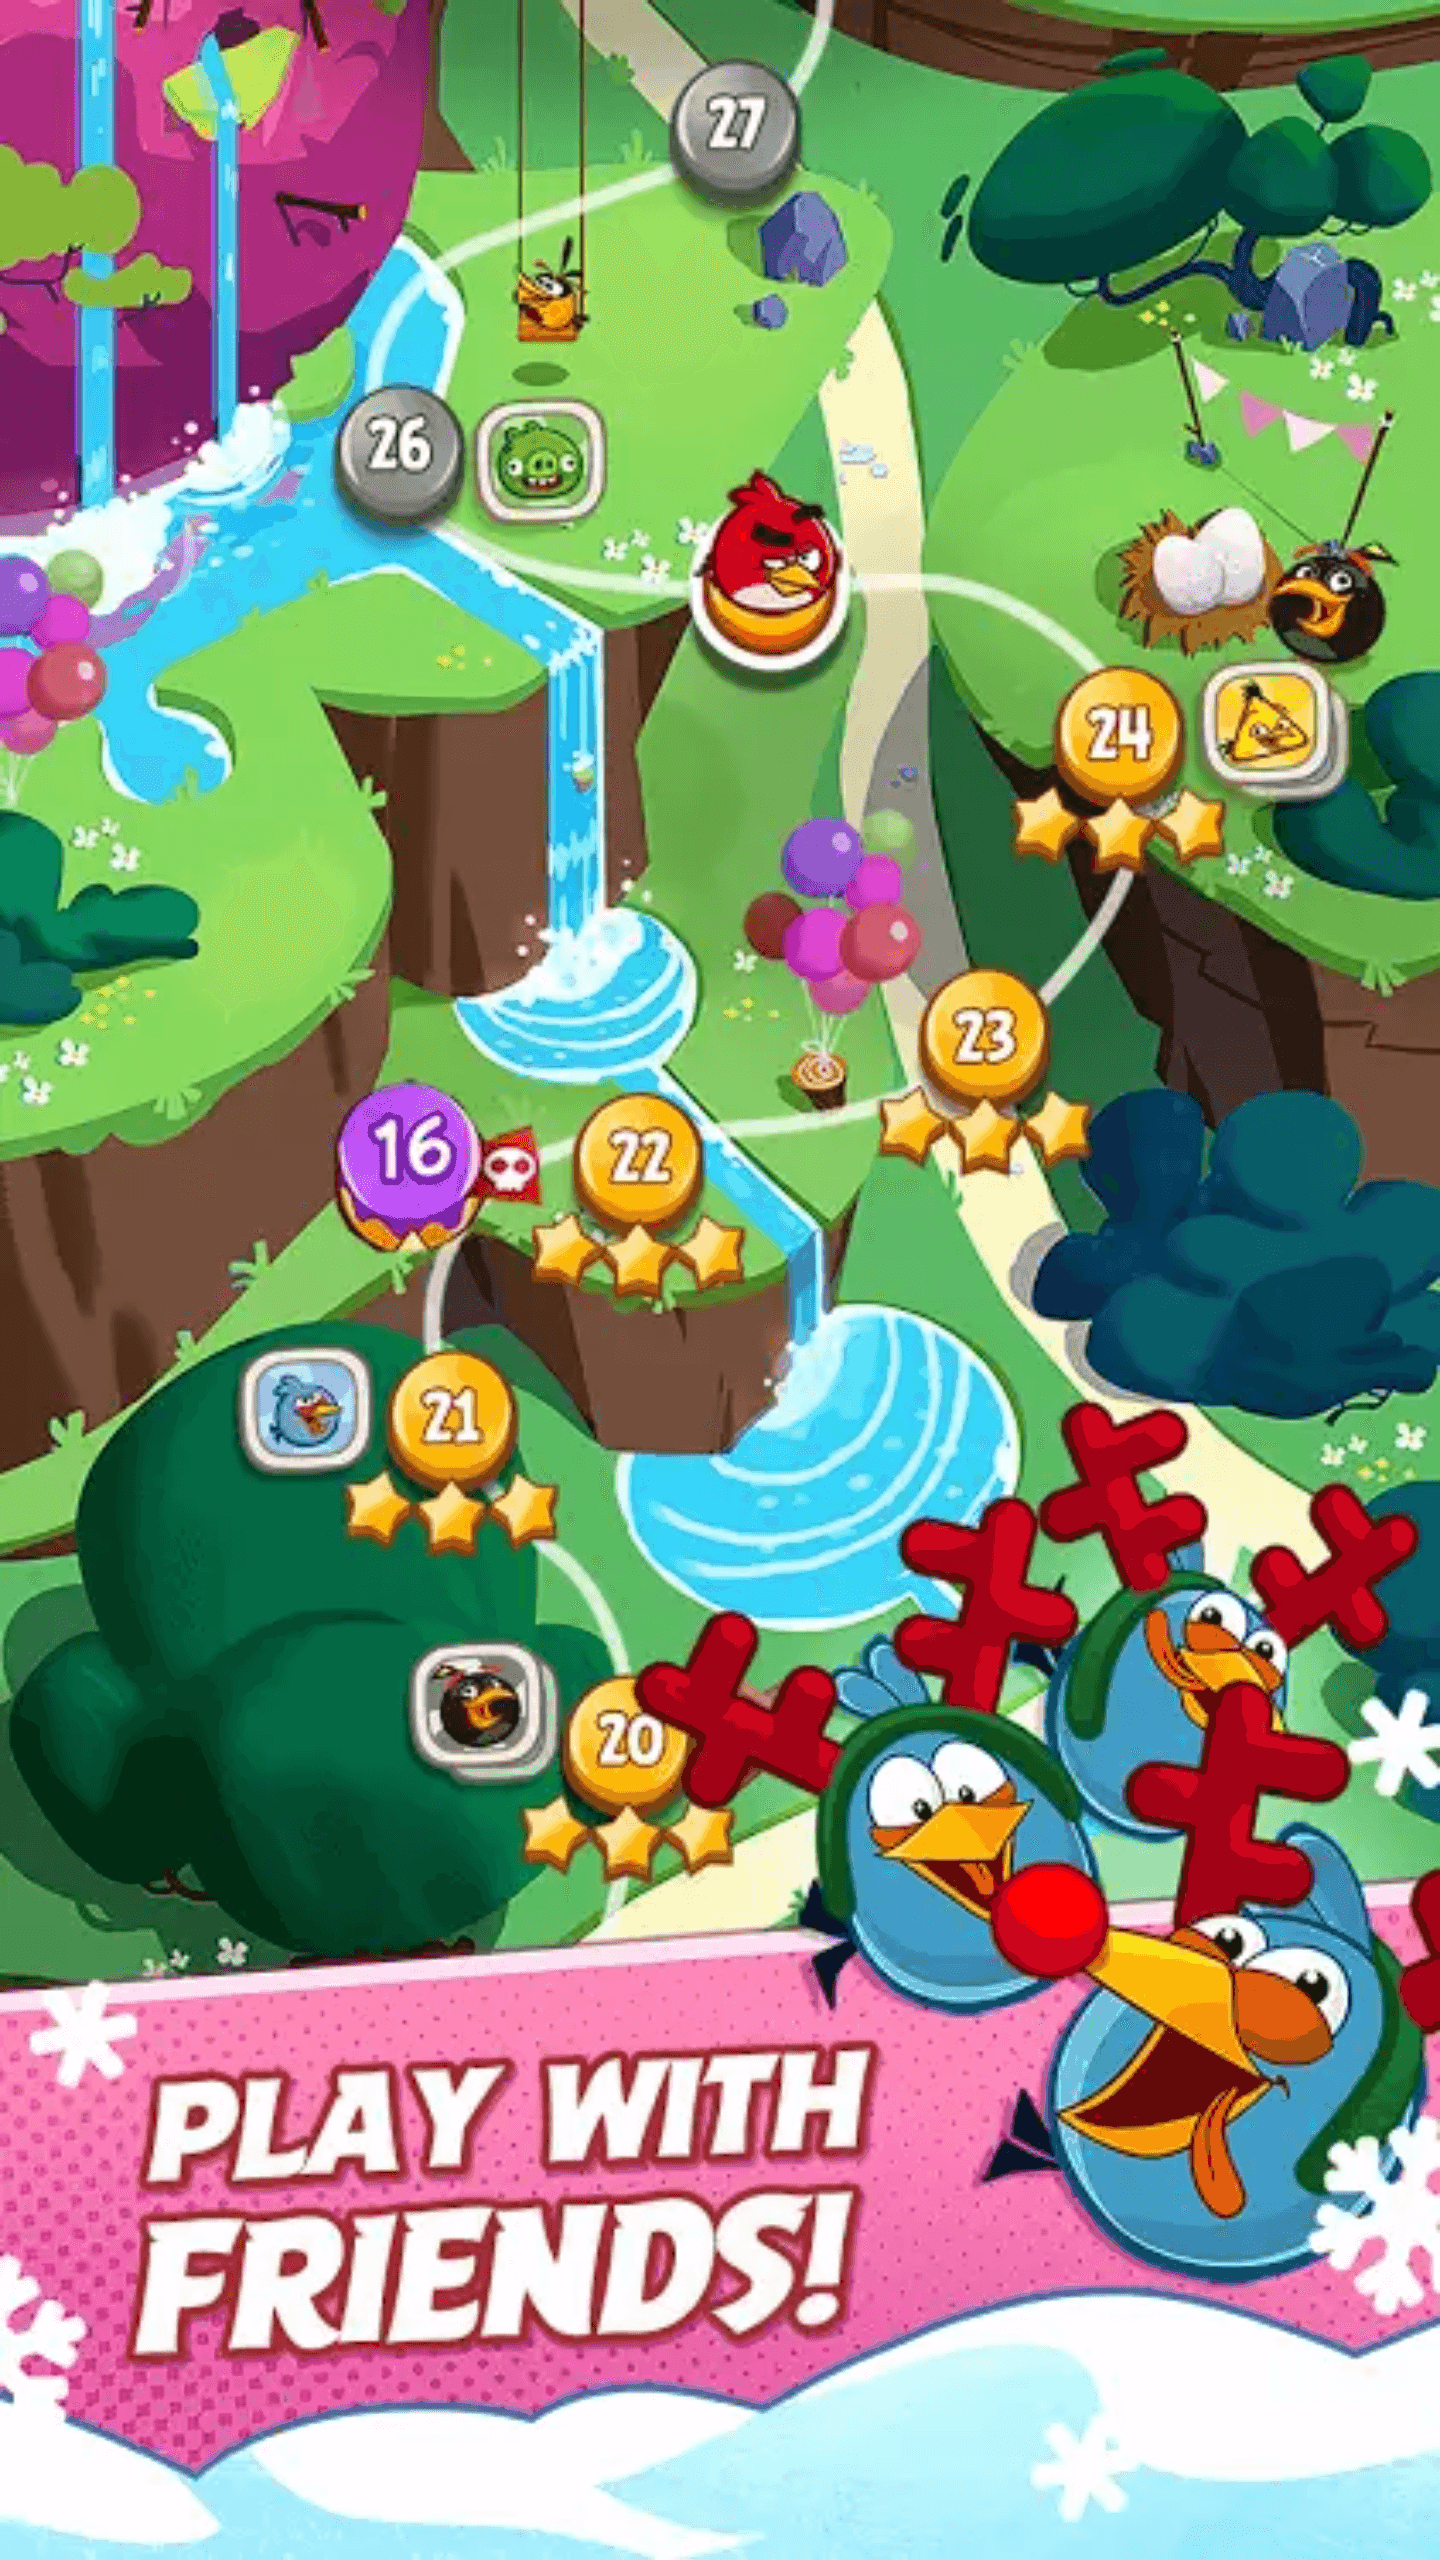 Angry Birds Blast Screenshot 02